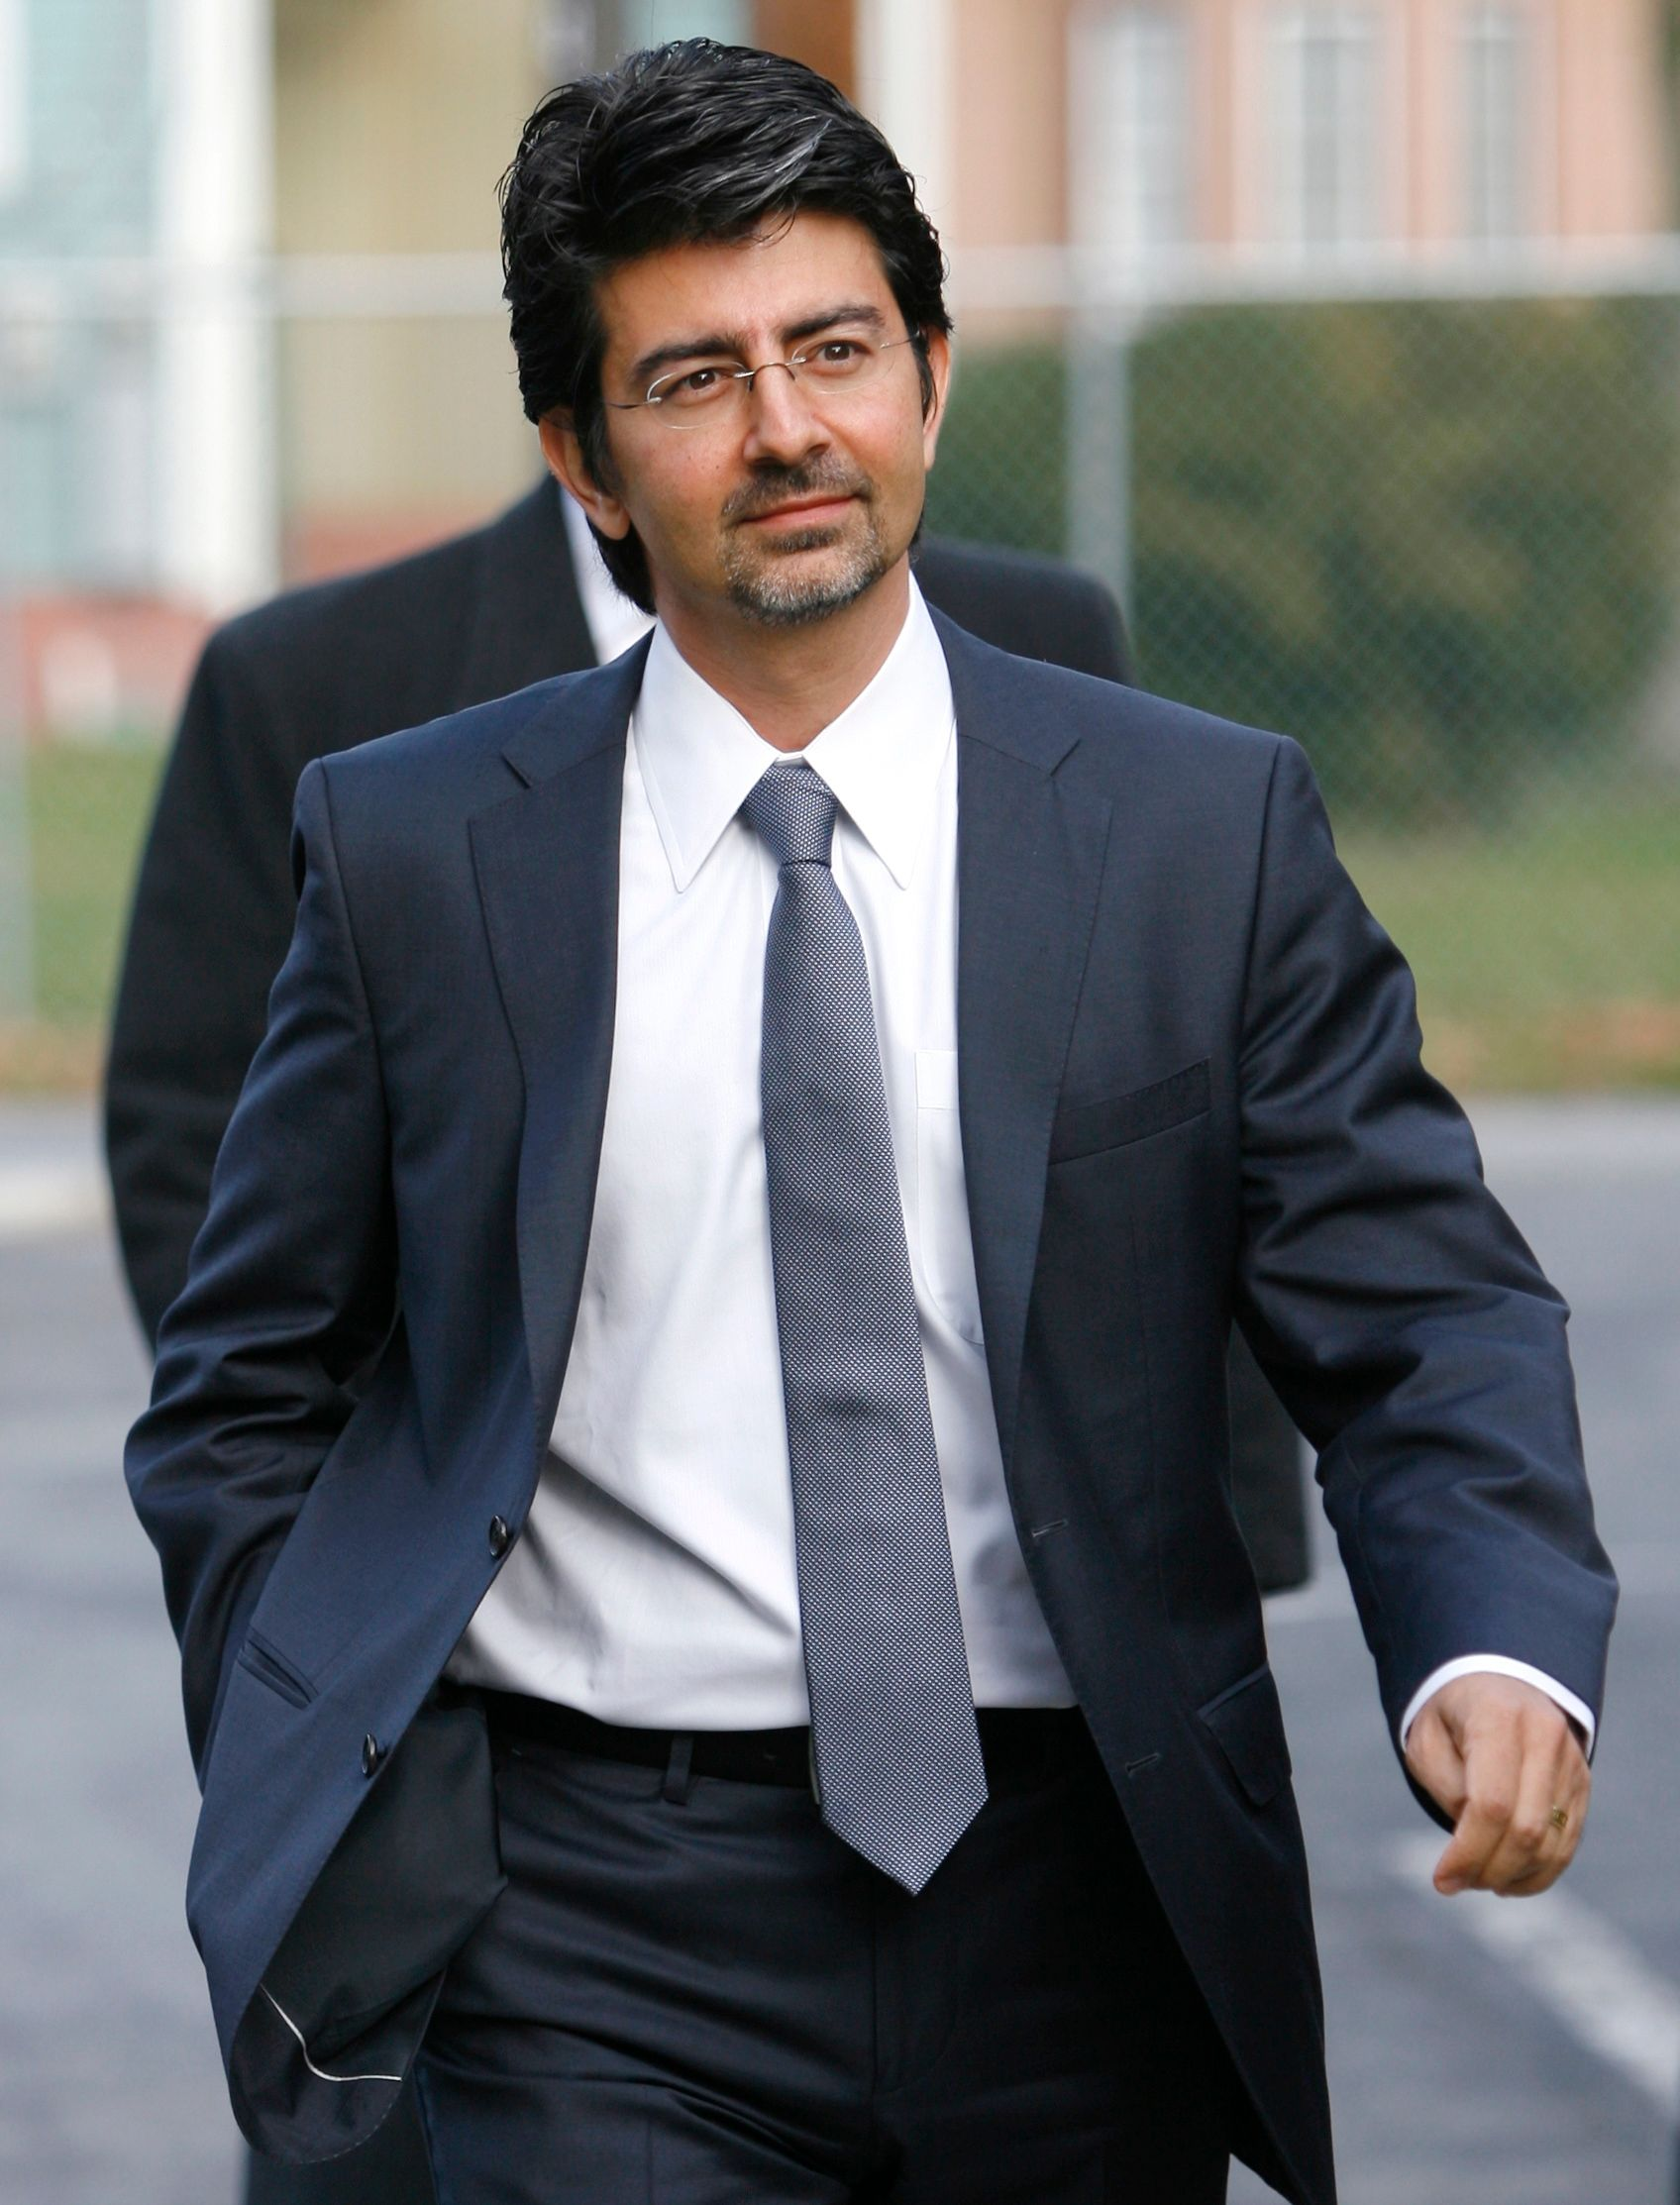 Pierre Omidyar, fondateur de eBay.